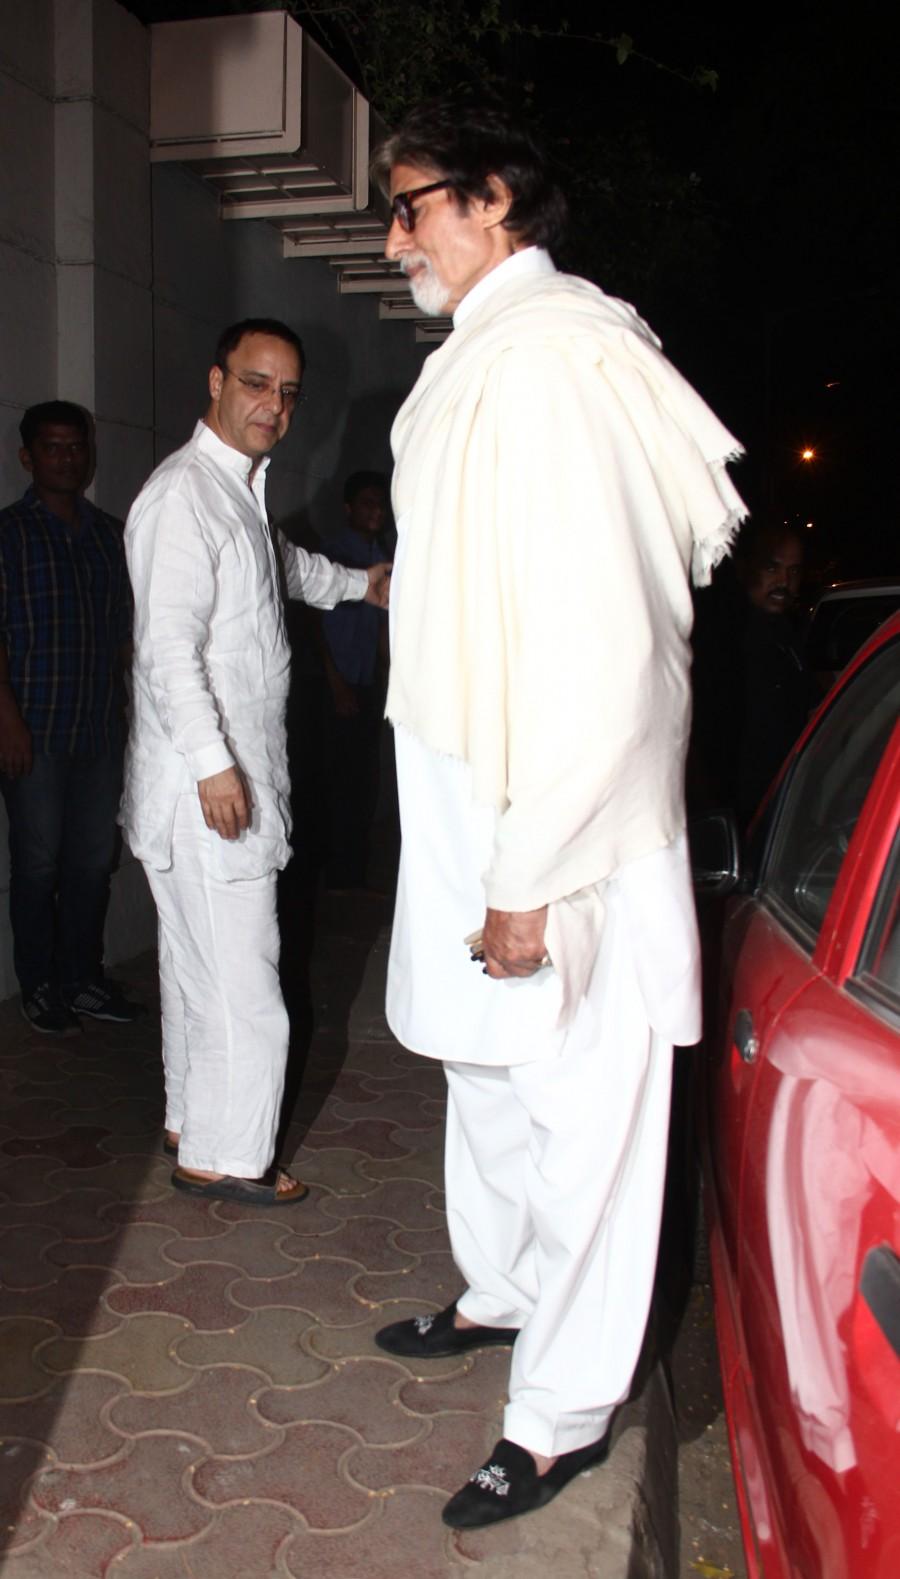 Amitabh Bachchan,Amitabh Bachchan spotted,Amitabh Bachchan photos,celebs spotted,Vidhu Vinod Chopra,celebs at santacruz